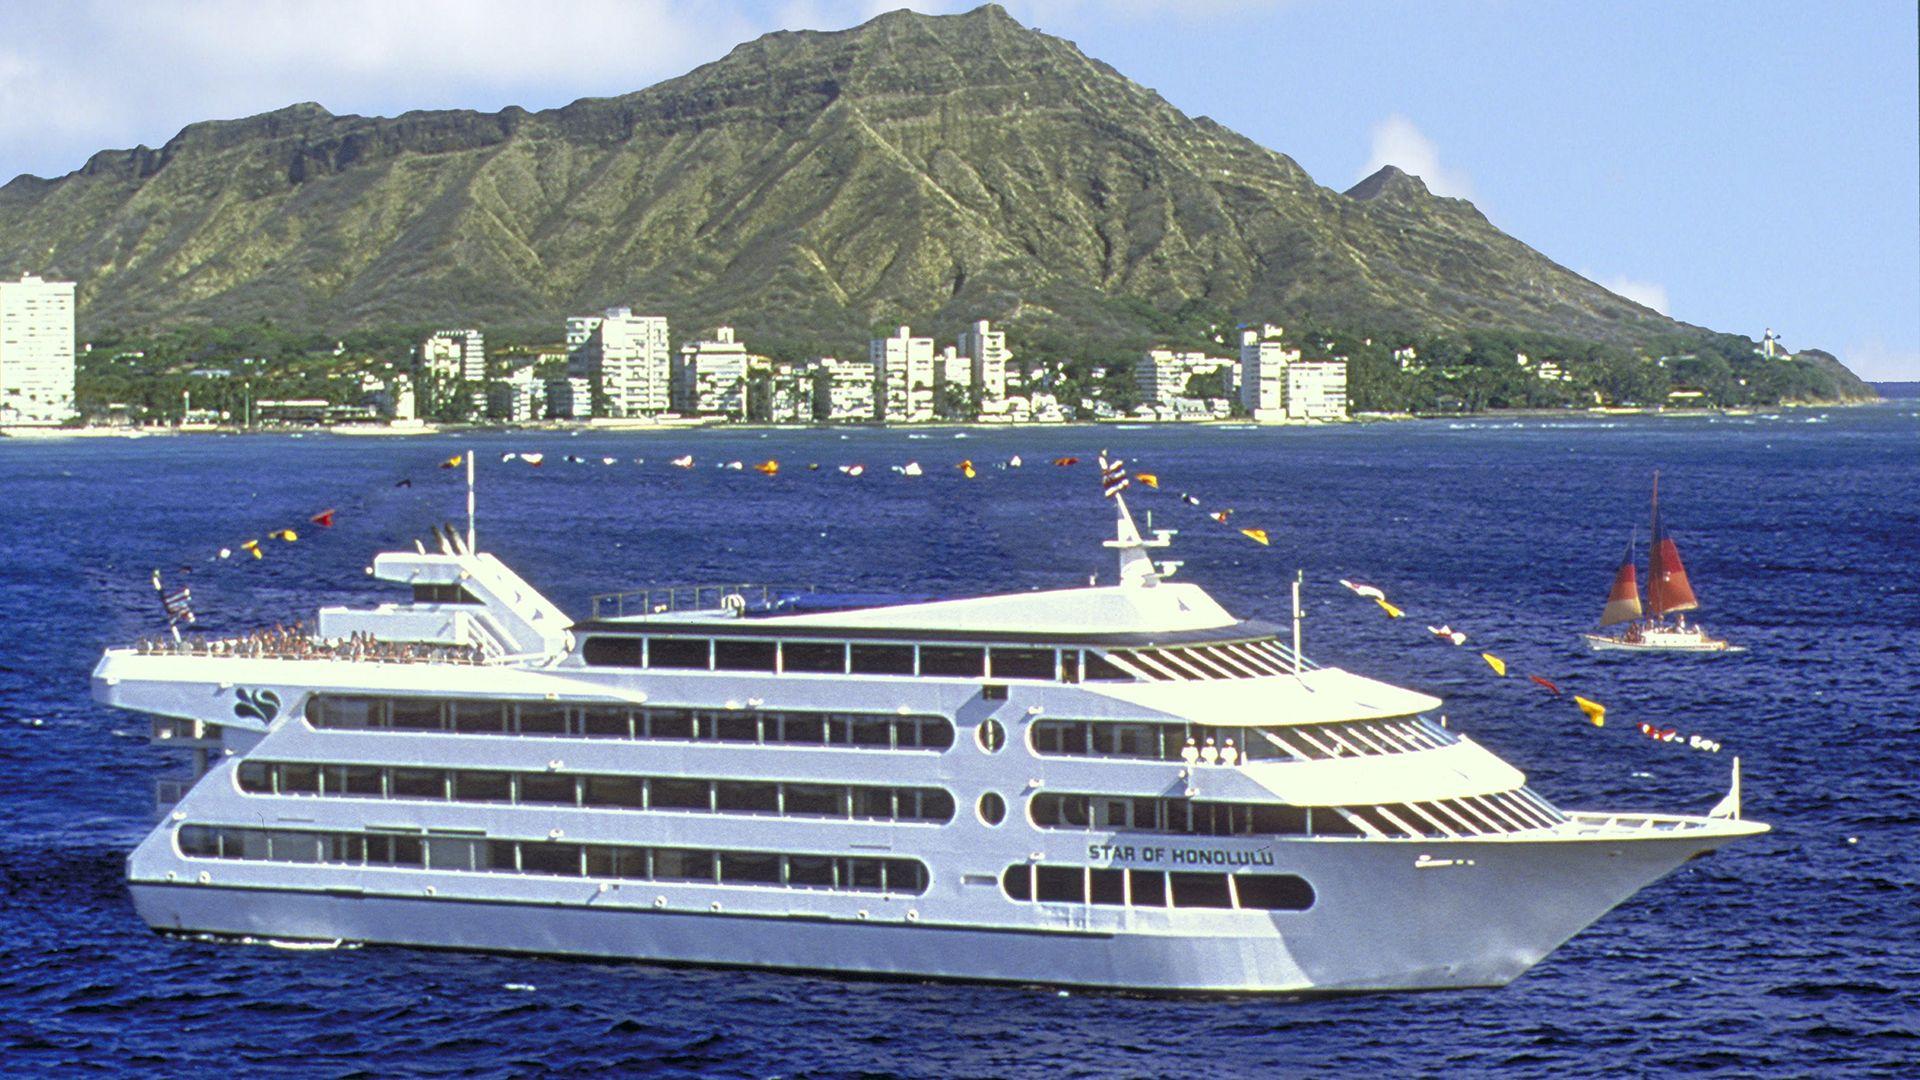 Star_of_Honolulu_1920x1080.jpg